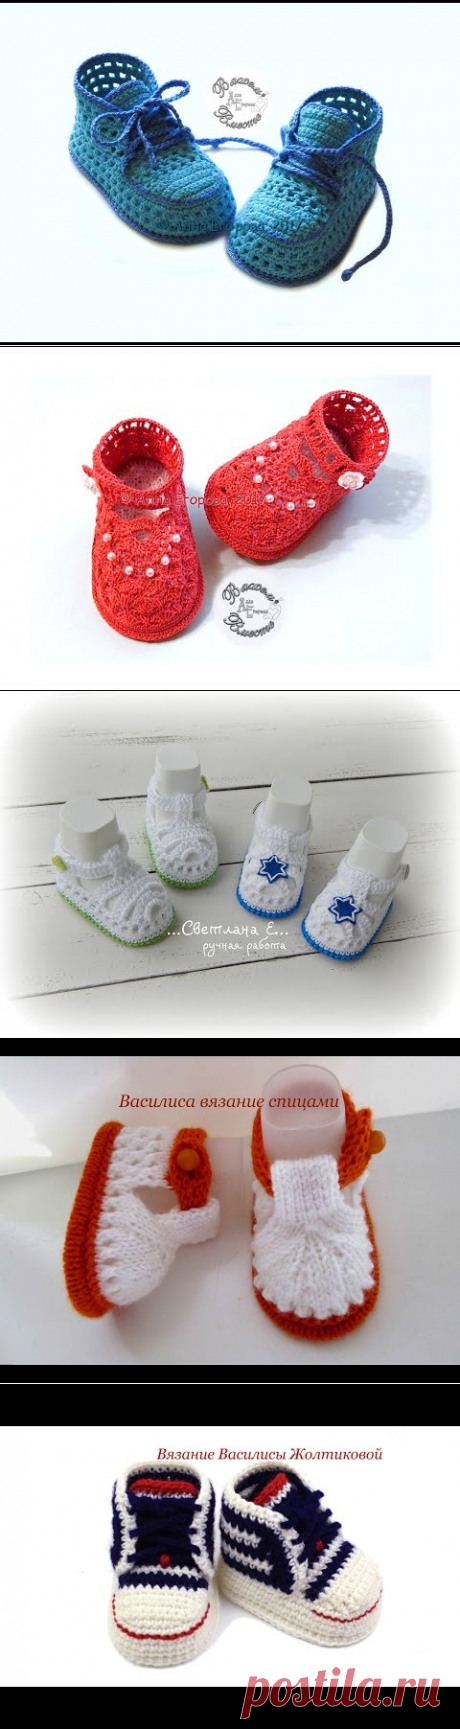 Кеды пинетки летние крючком //Sneakers booties crochet summer// - YouTube